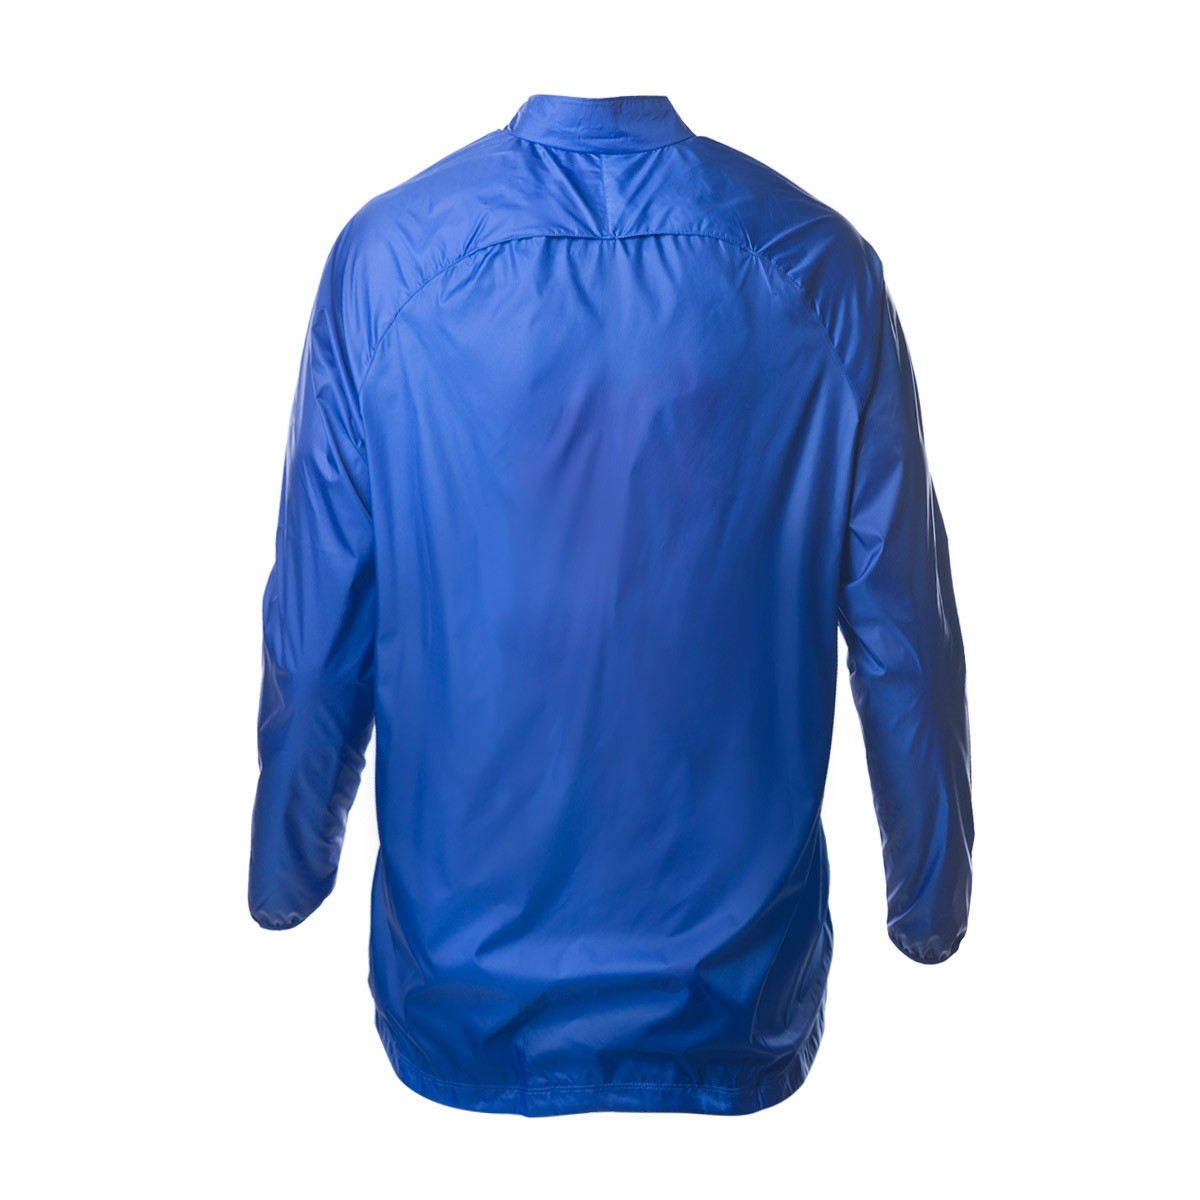 4574cd6be Jacket Nike Repel Academy Hyper royal-Obsidian - Football store Fútbol  Emotion